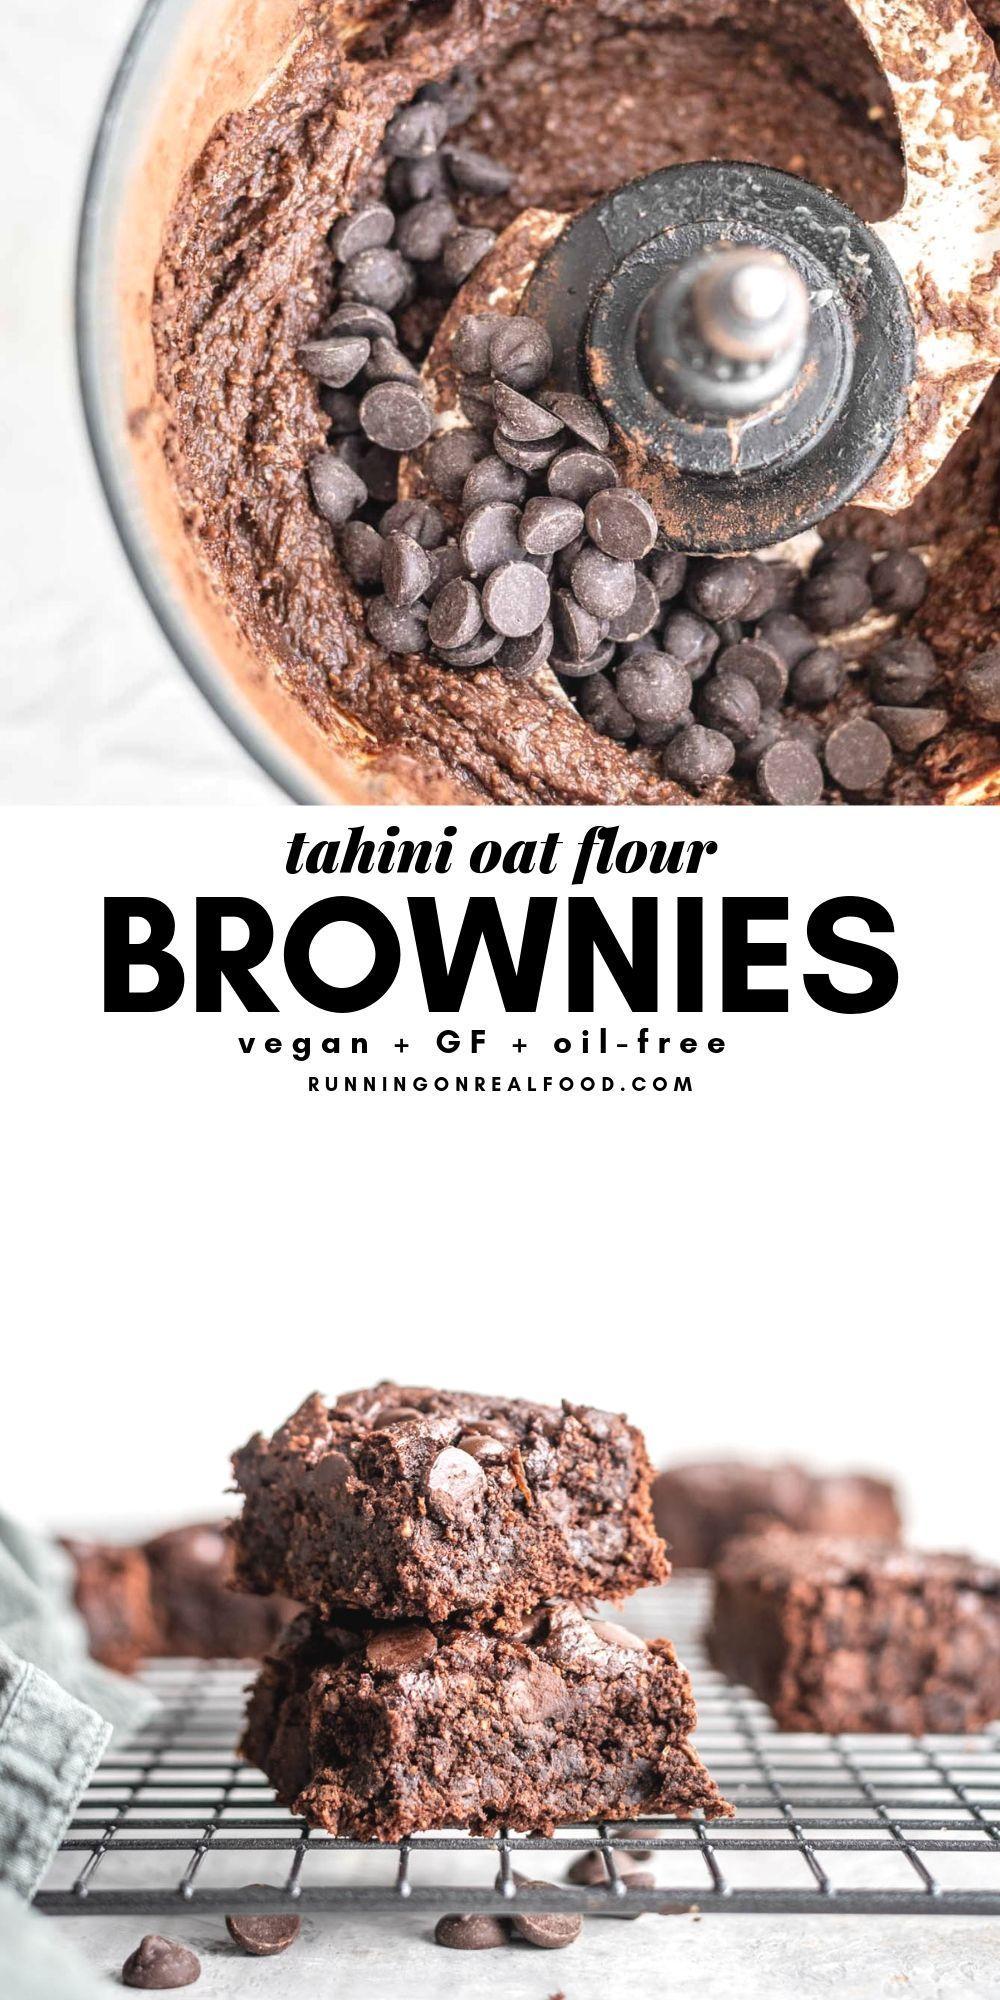 Vegan Oat Flour Brownies Recipe With Images Food Vegan Desserts Vegan Sweets